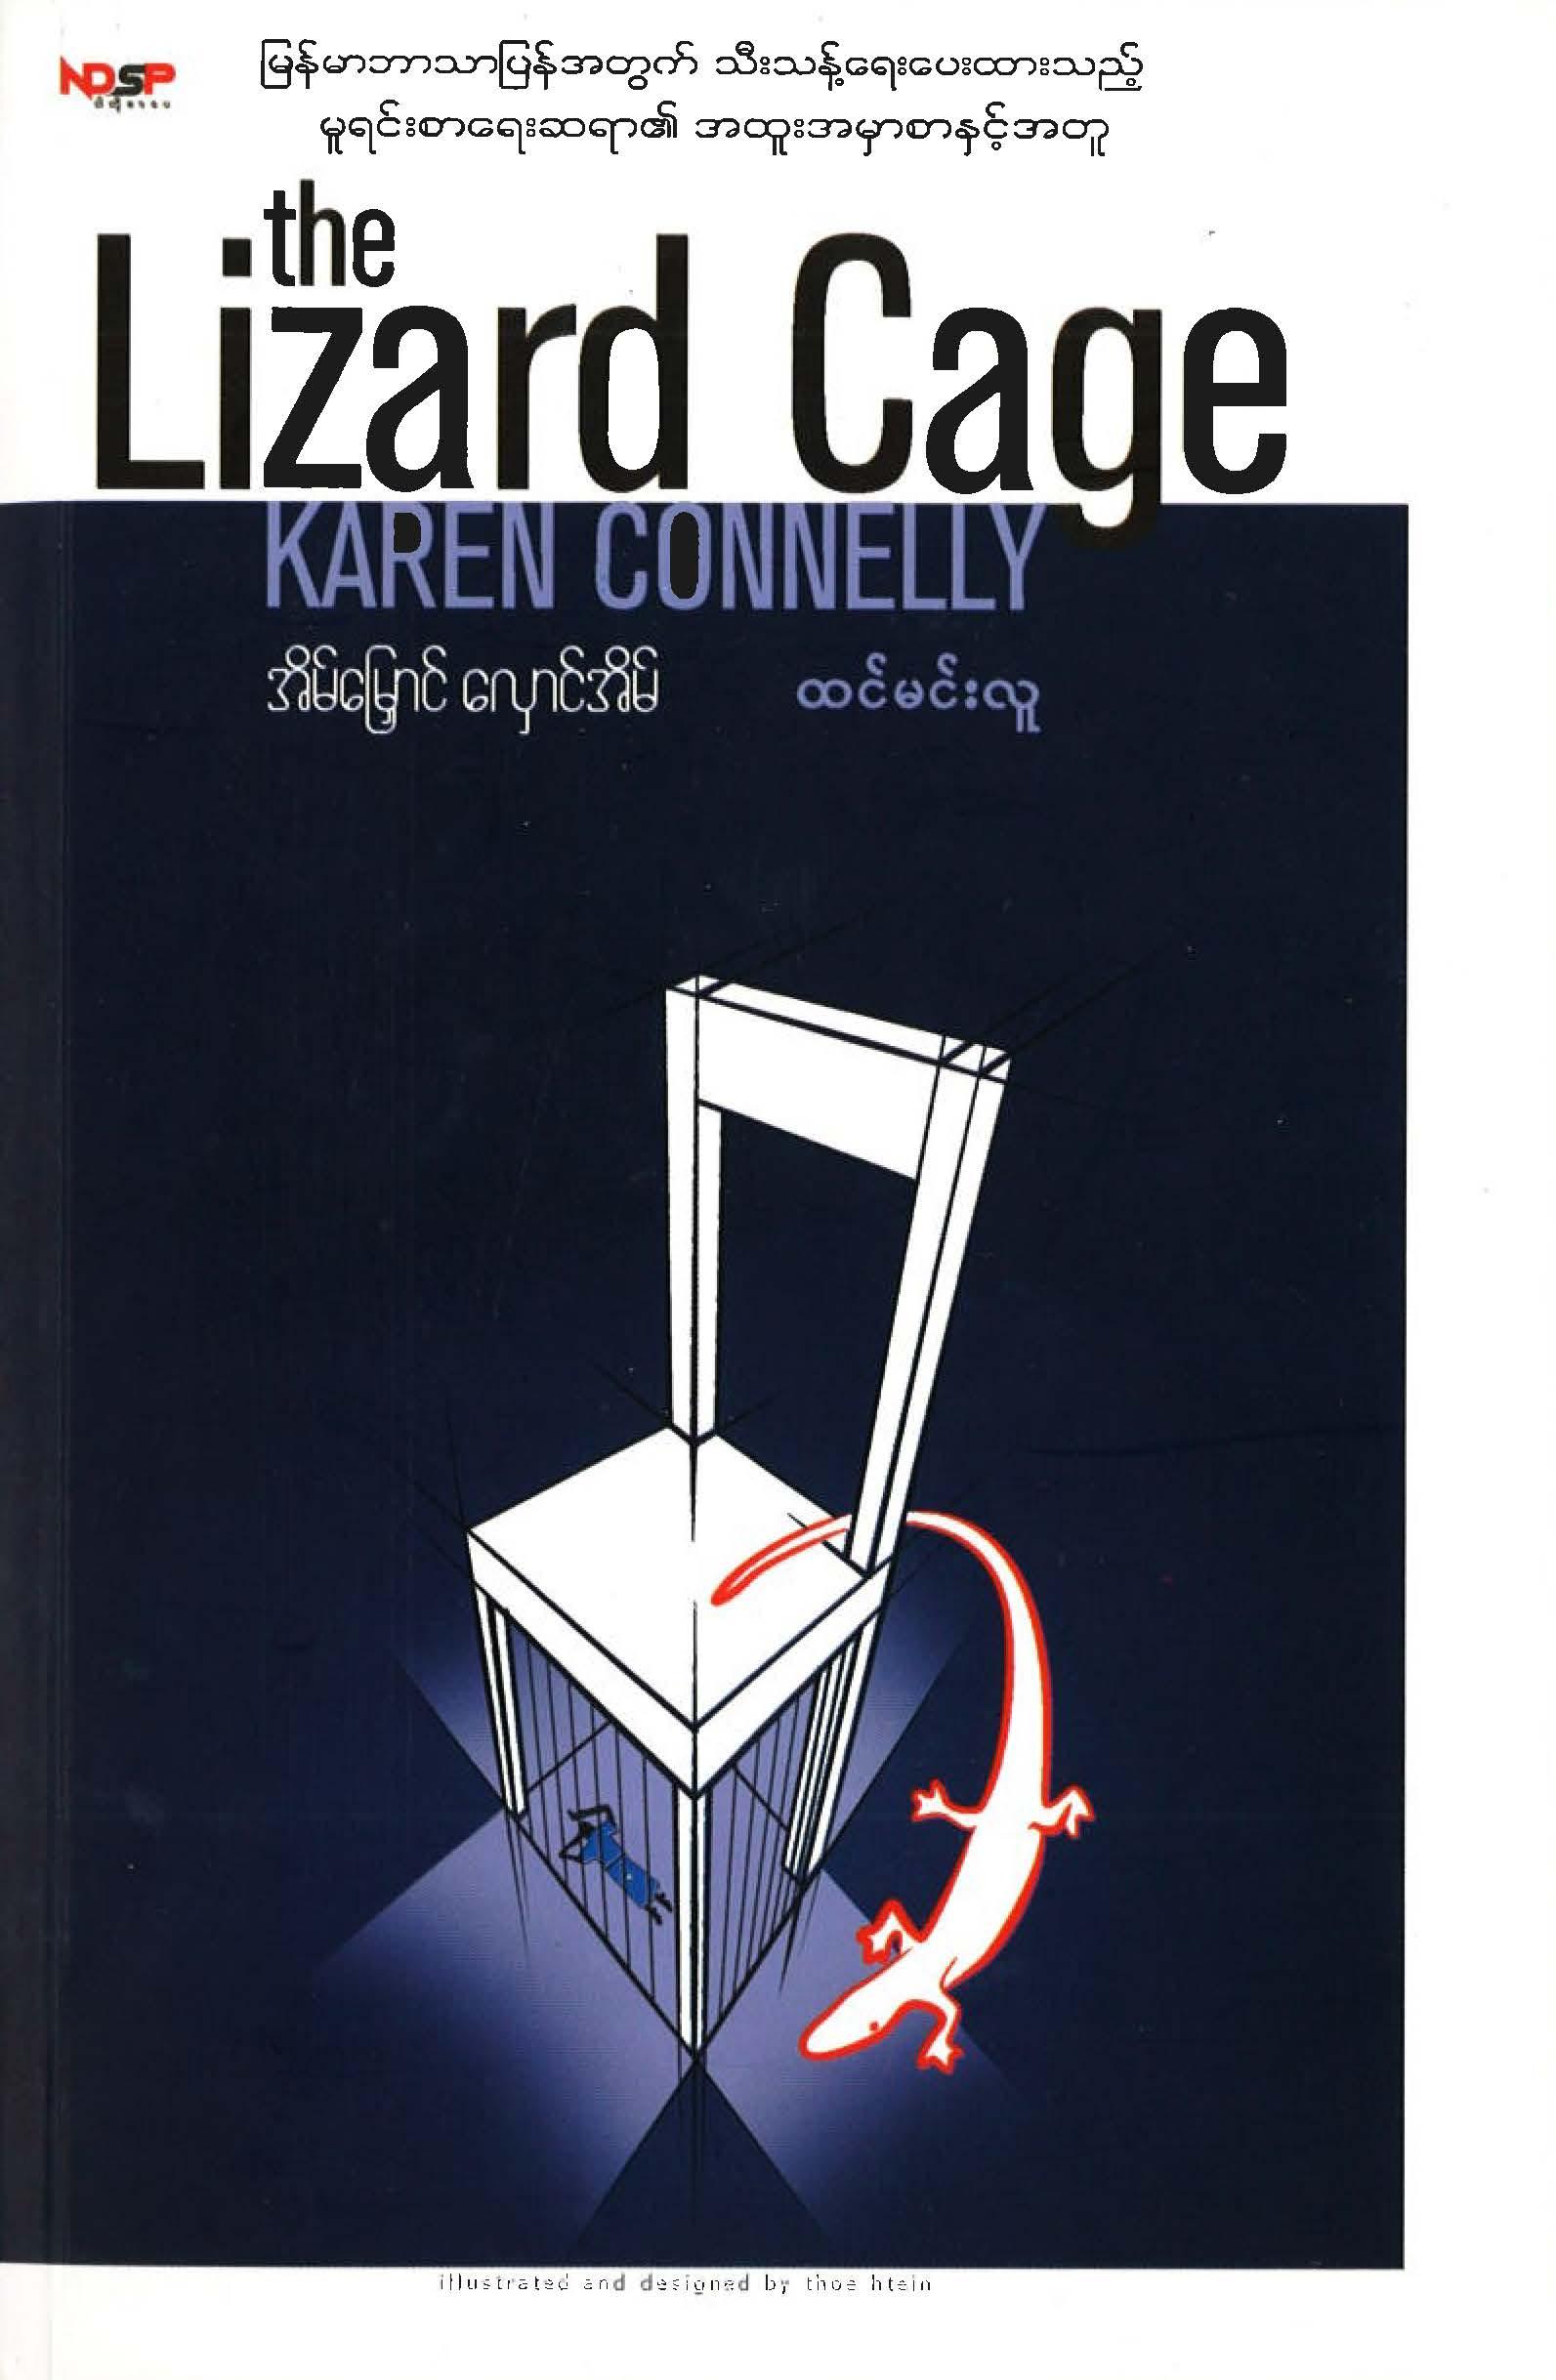 The Lizard cage Burma Cover.jpg